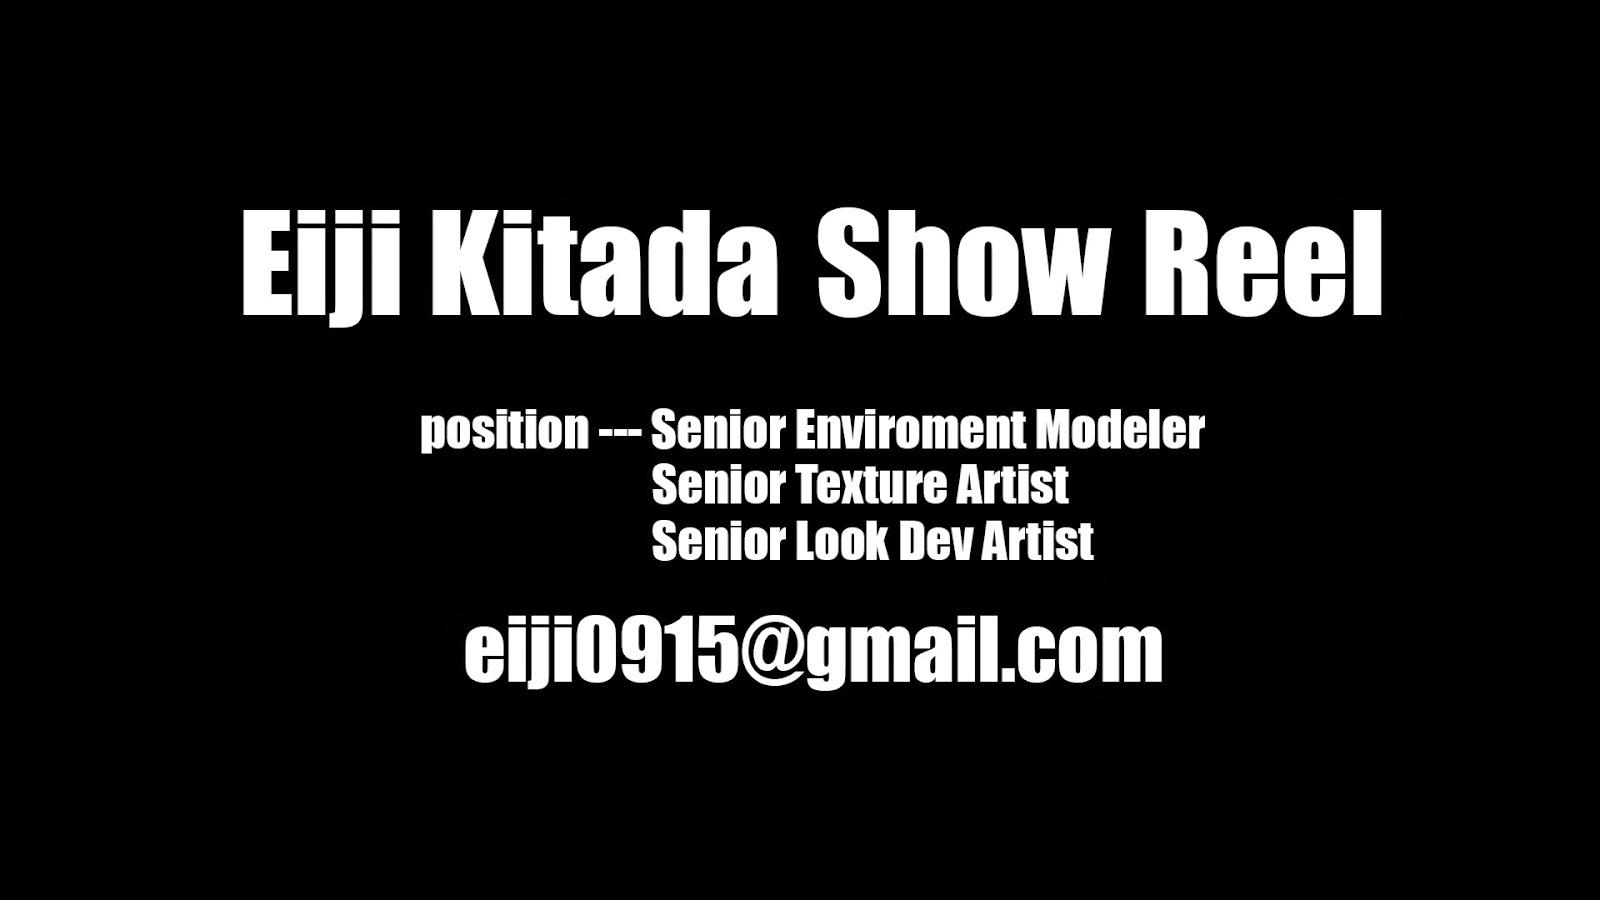 Eiji Kitada Show Reel 2014